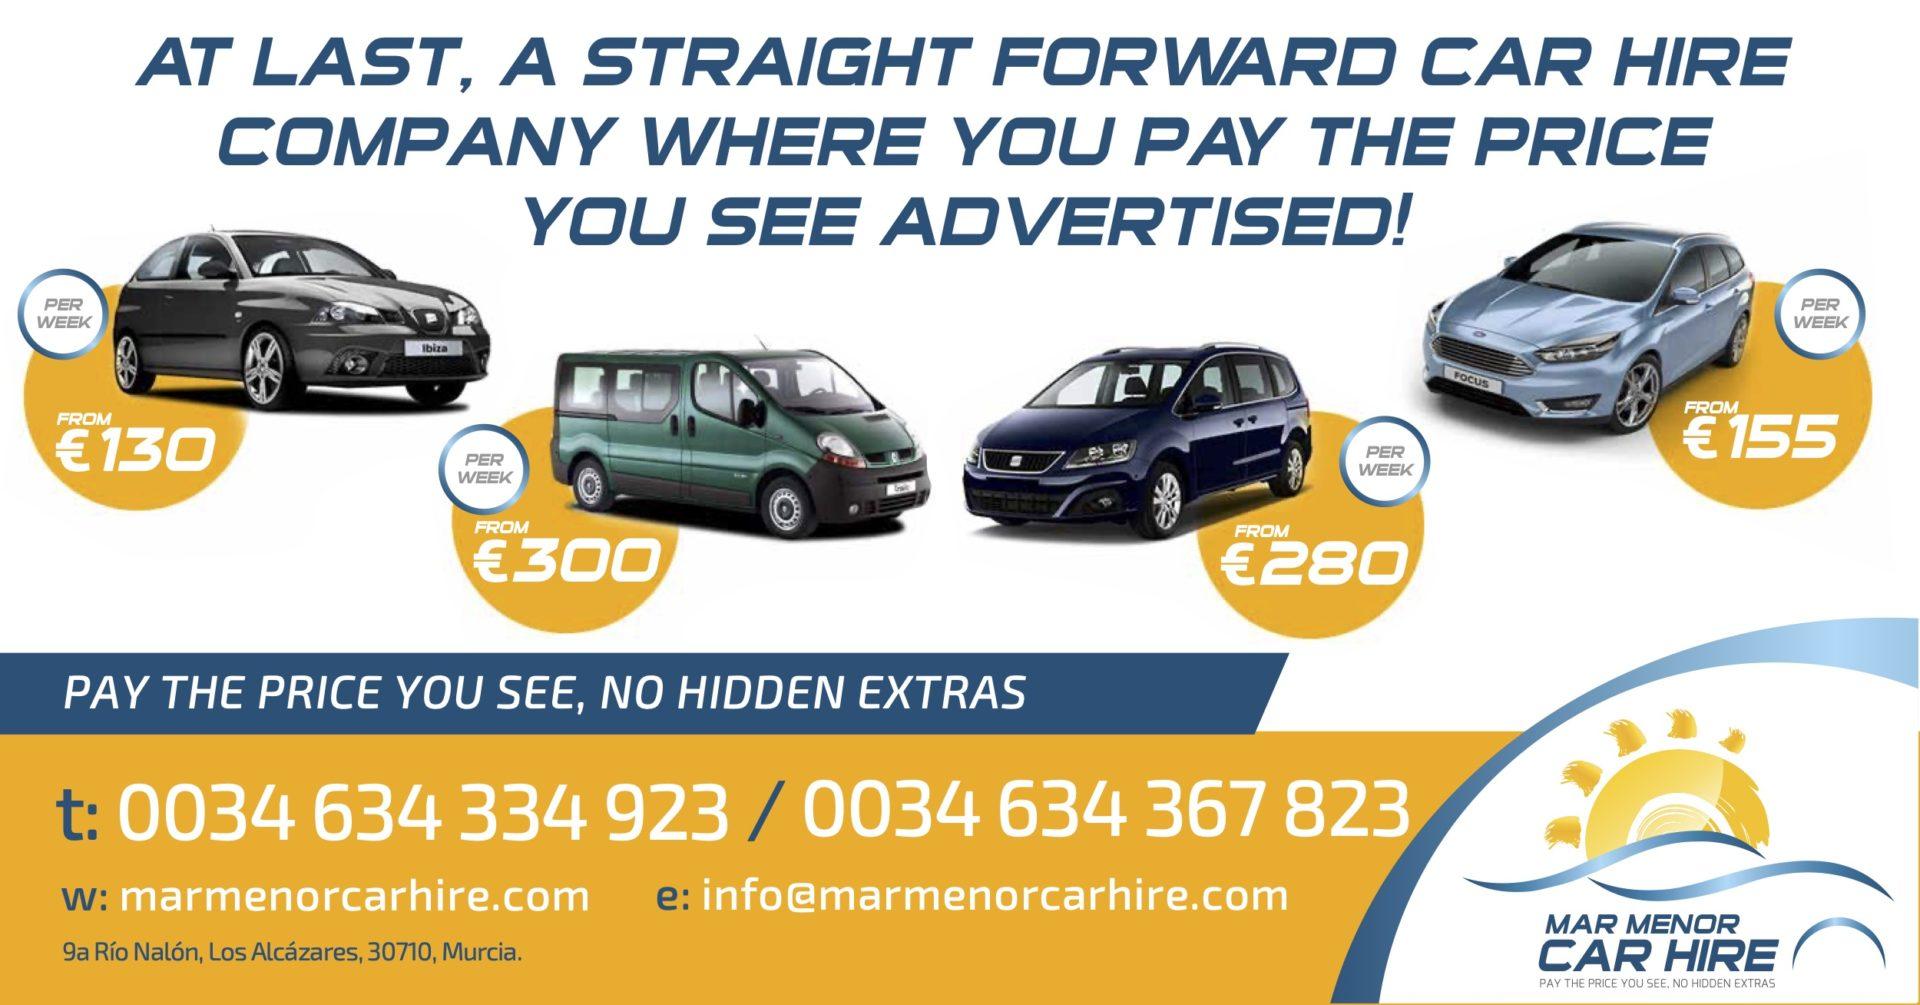 Mar Menor Car Hire Company for Sale